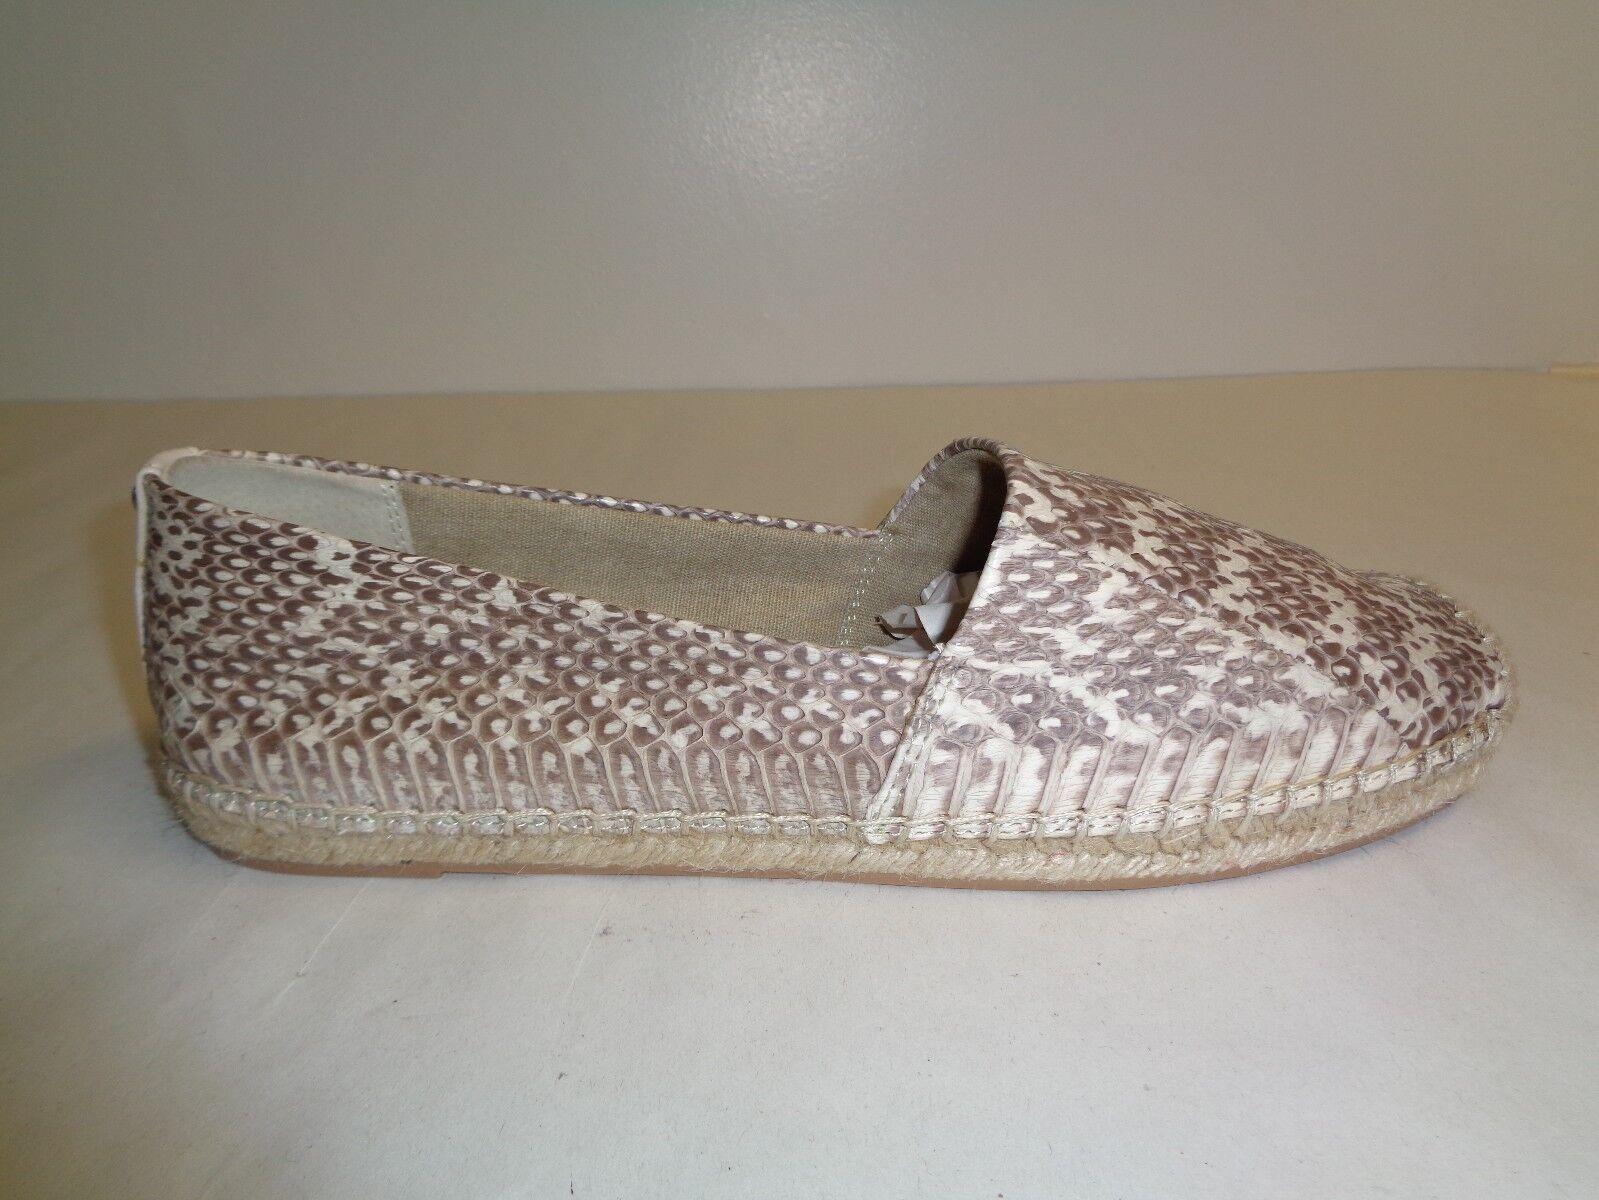 Sam Edelman Taglia 8.5 LYNN Snake Print Pelle Moccasins Loafers New Donna Scarpe